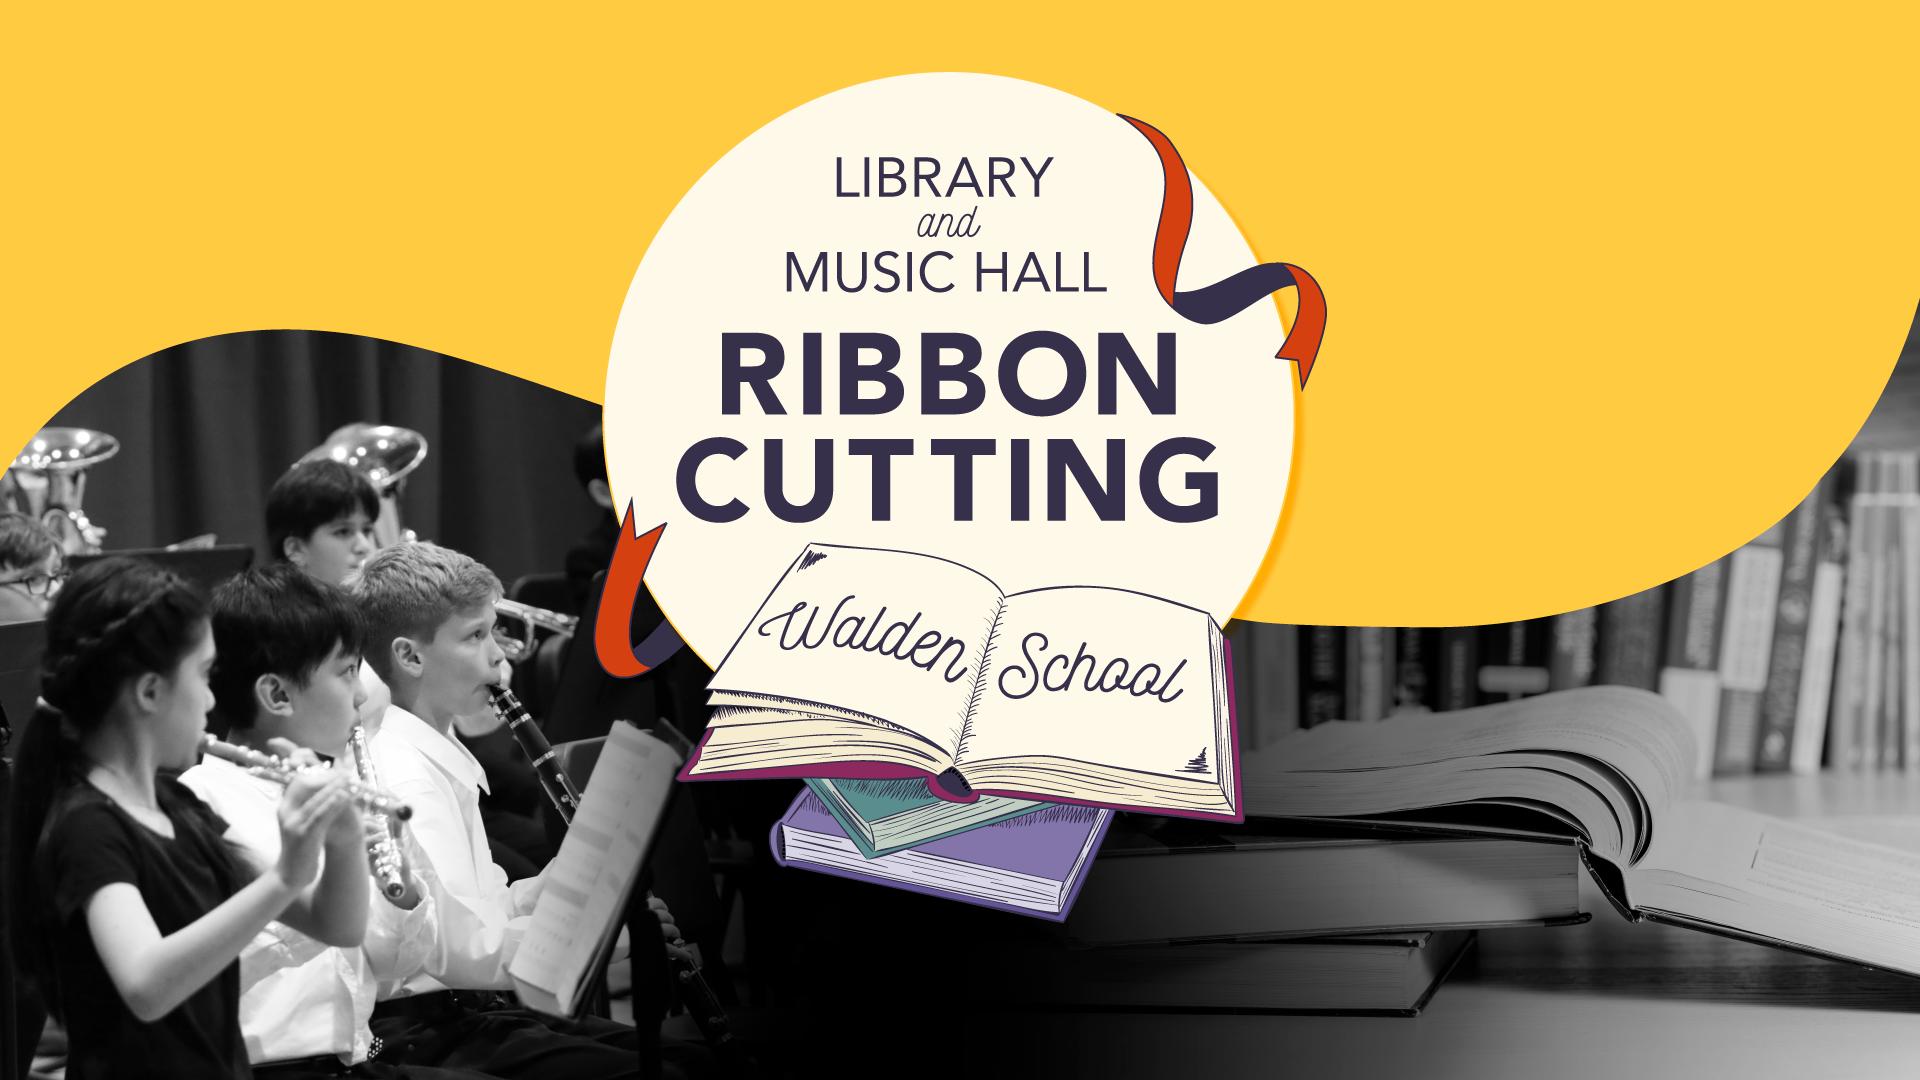 Digital_ribbon-cutting-1920x1080px.png